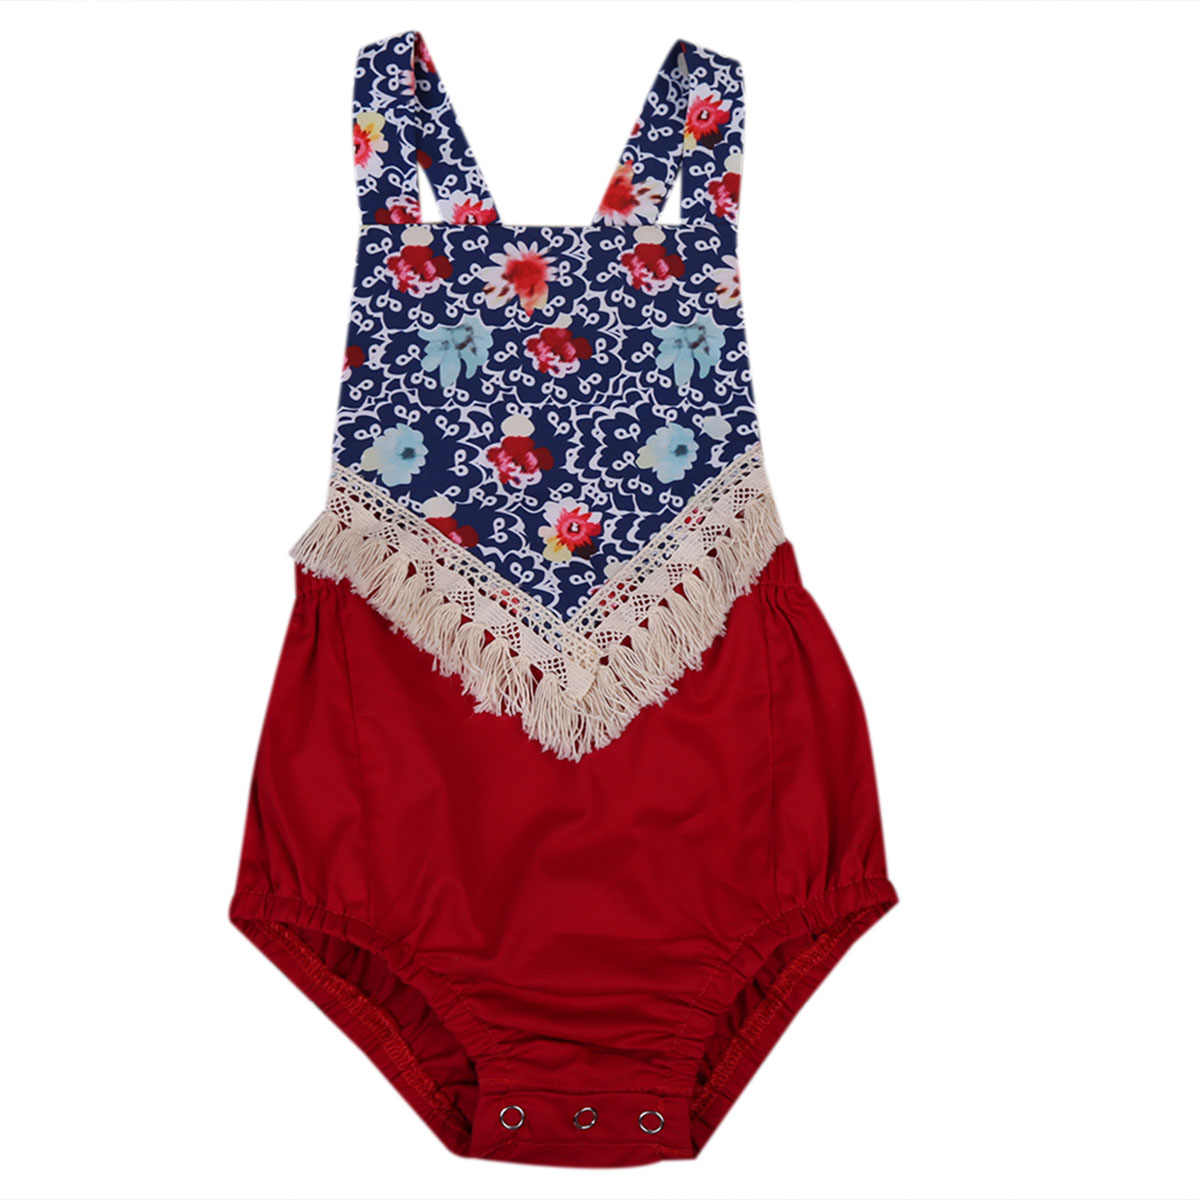 c11f2ee8b0e3 Detail Feedback Questions about 0 24M Summer Boho Newborn Infant ...